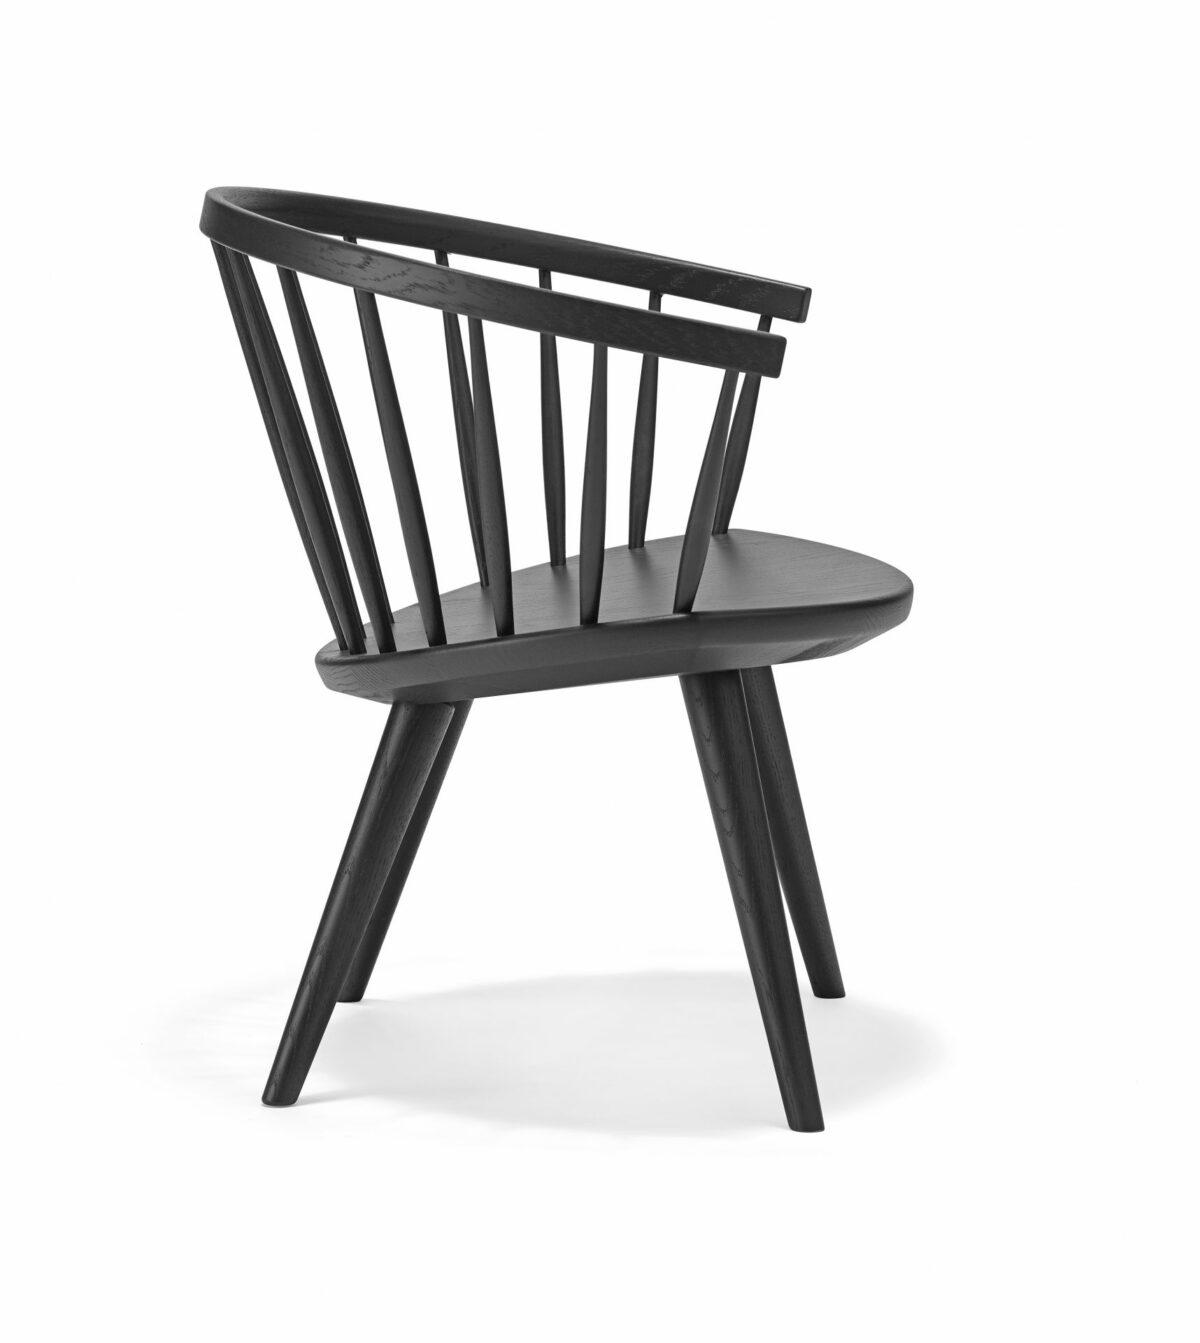 arka stol